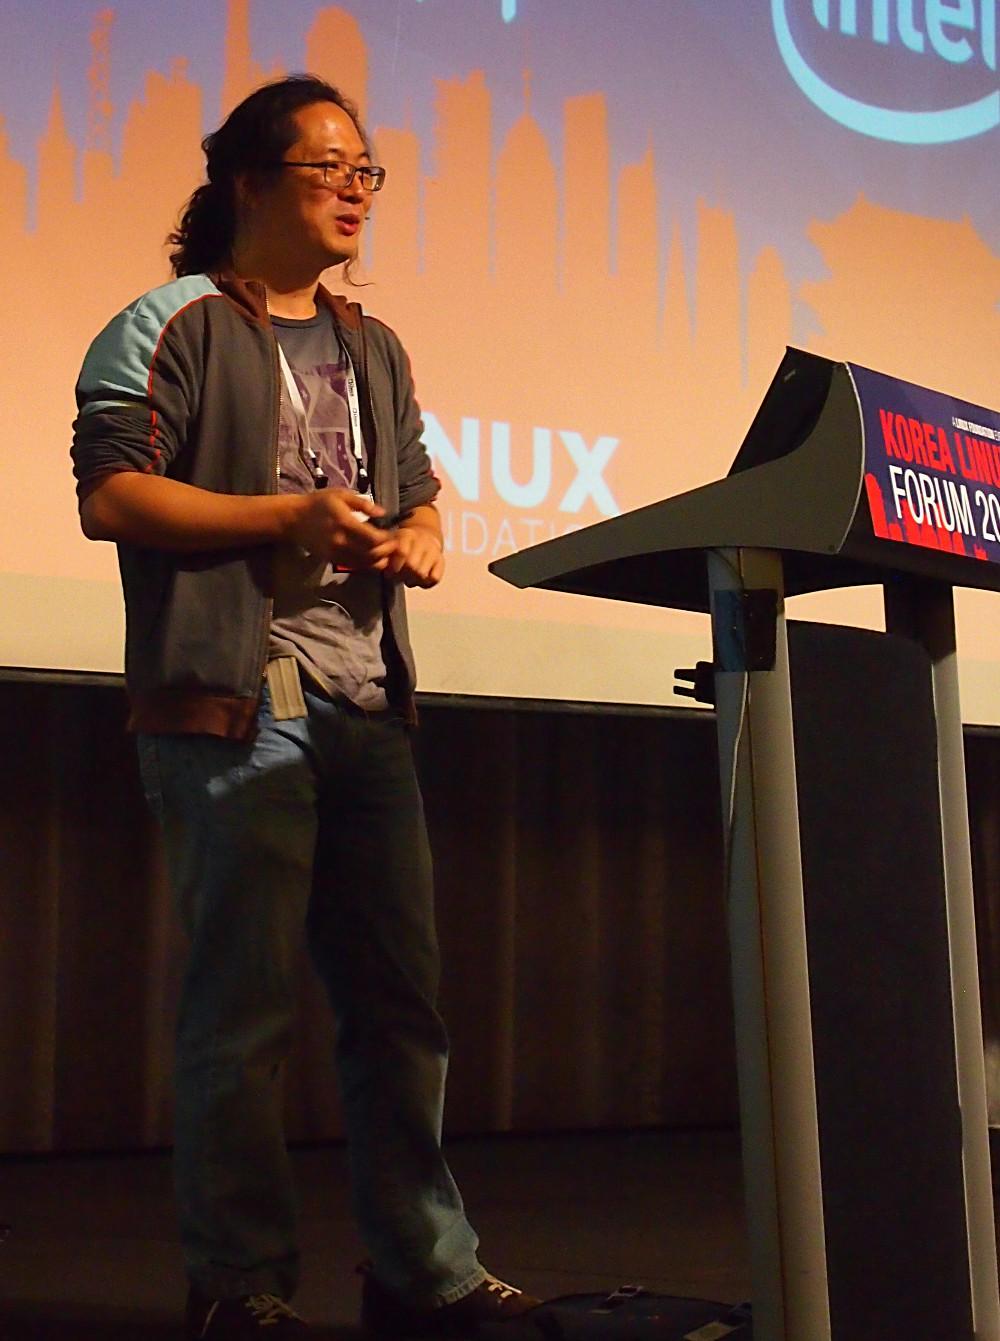 Tejun Heo at the 2012 Korean Linux Forum [LWN.net]